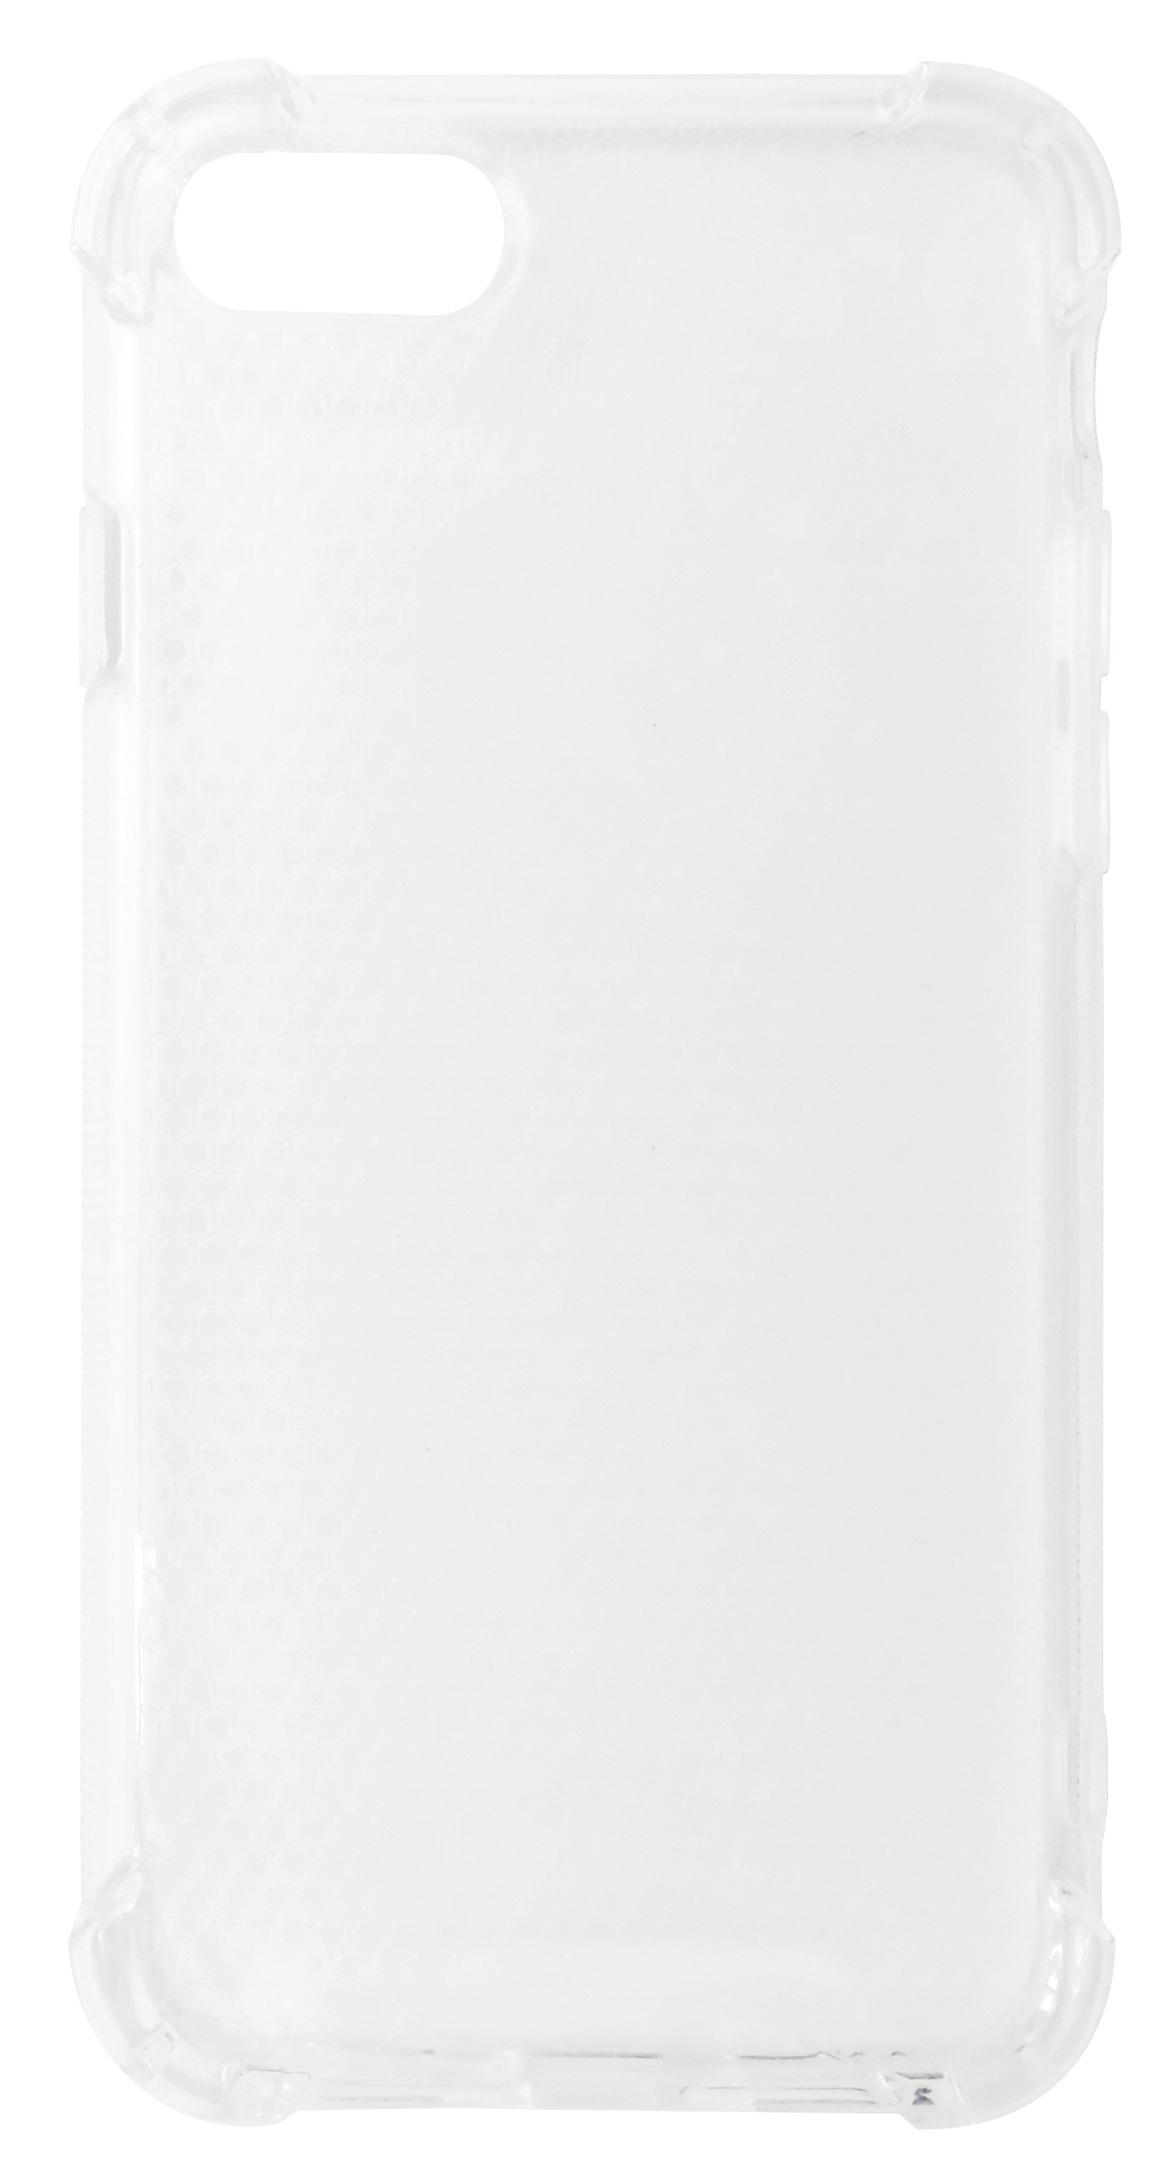 Husa tip capac spate Lensun cu colturi intarite plastic + silicon transparenta pentru Apple iPhone 7 / 8